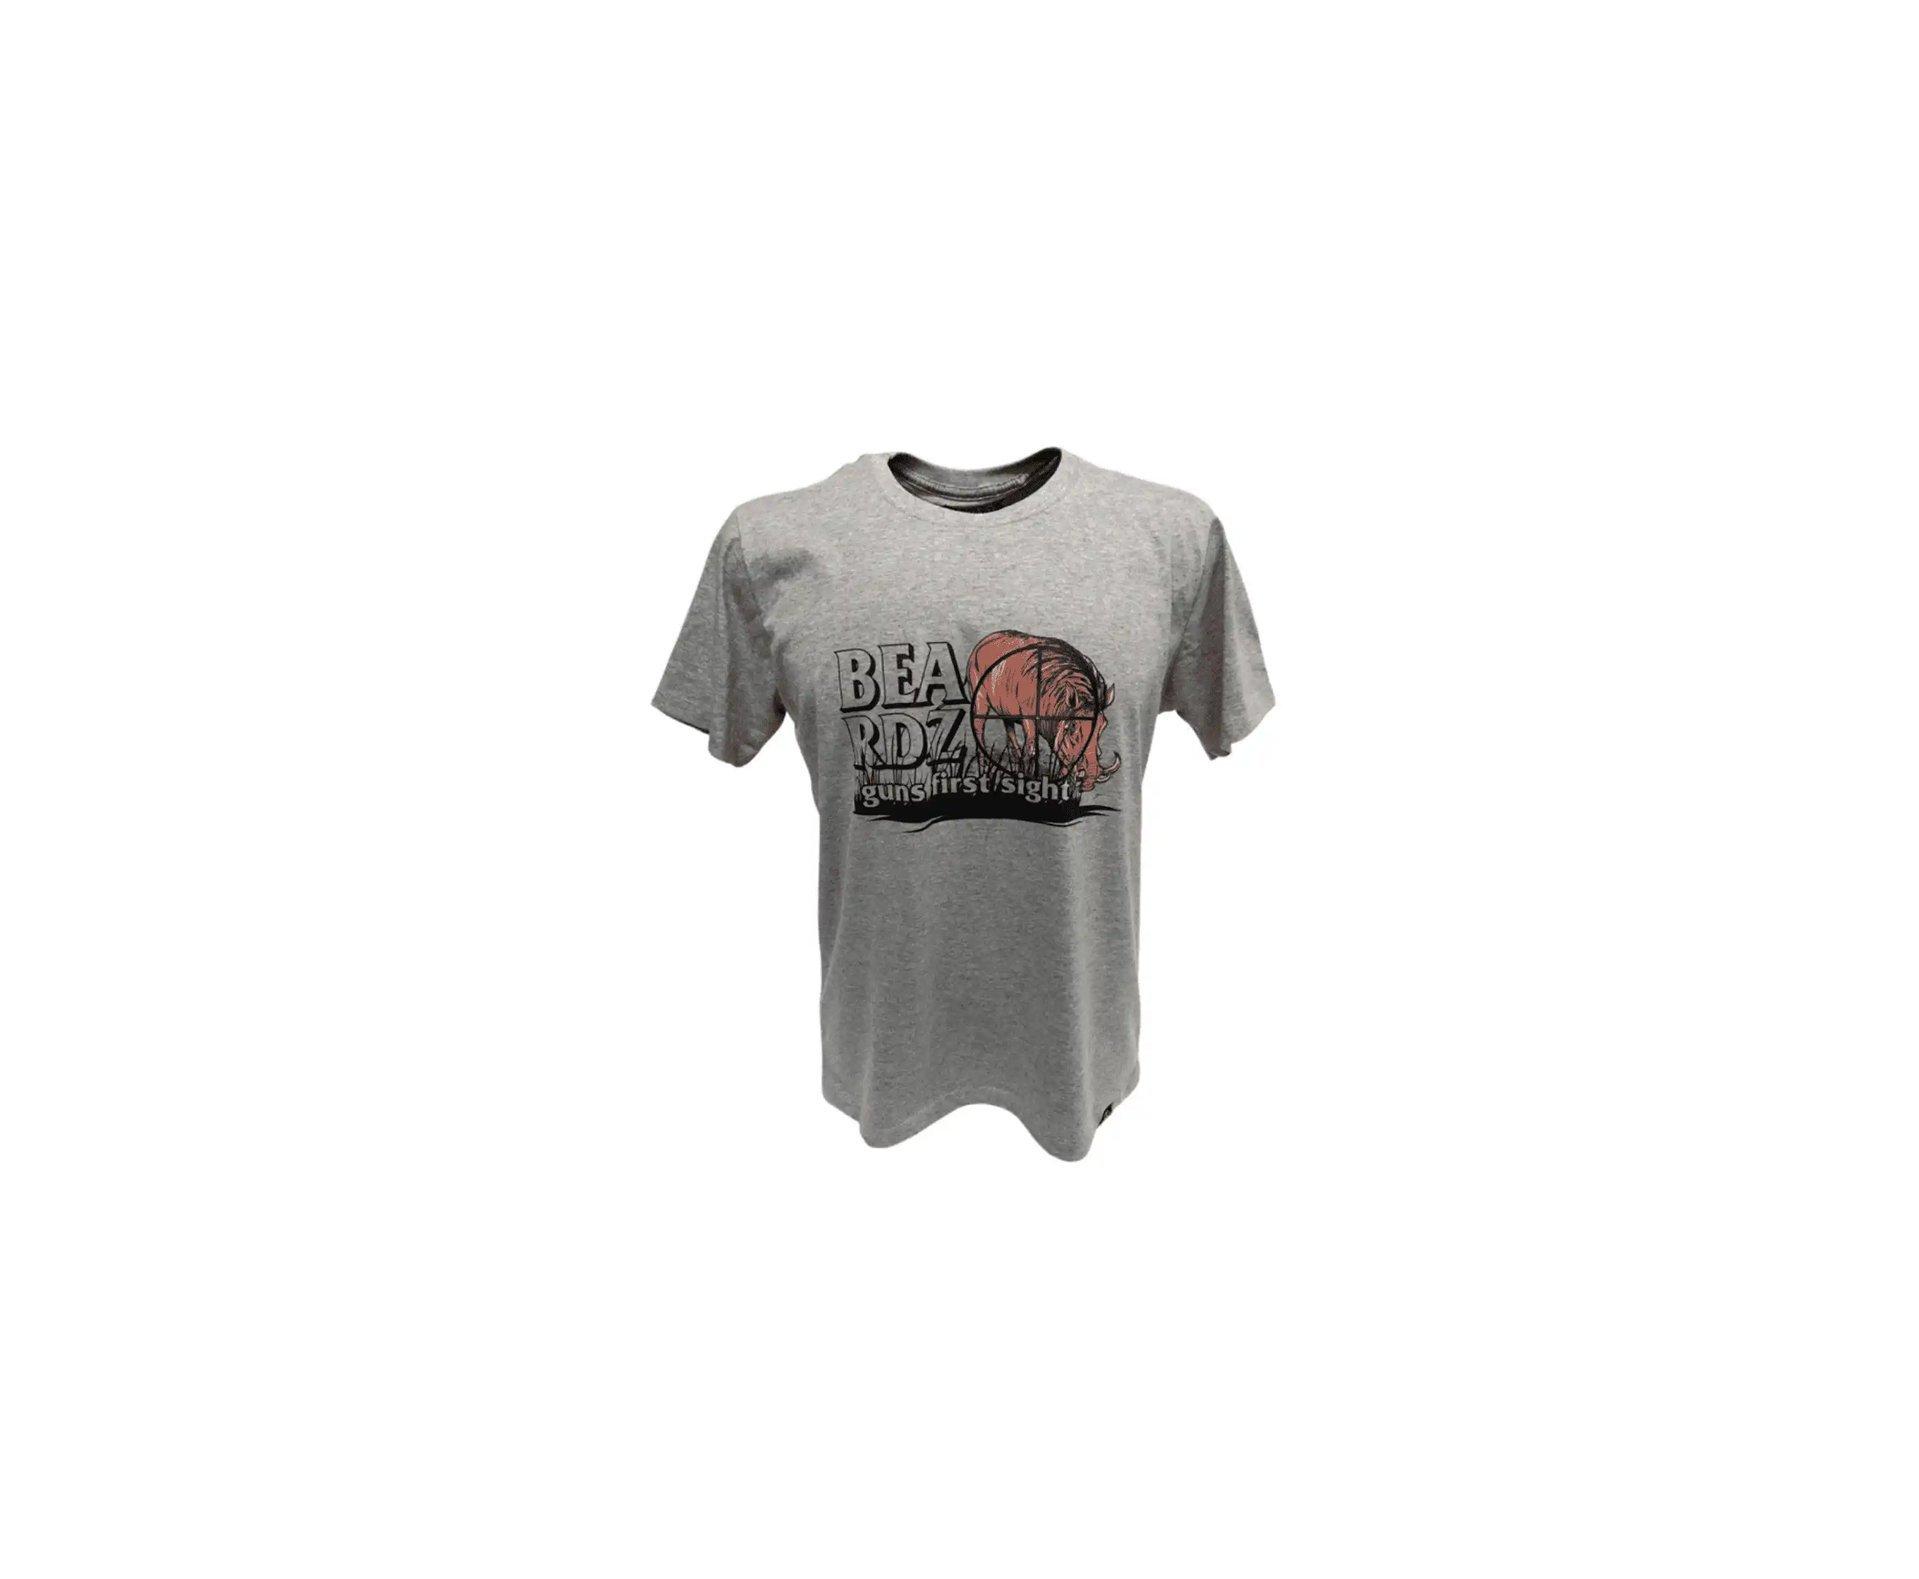 Camiseta Masculina Beardz Javali Wild Boar Sight Ts33